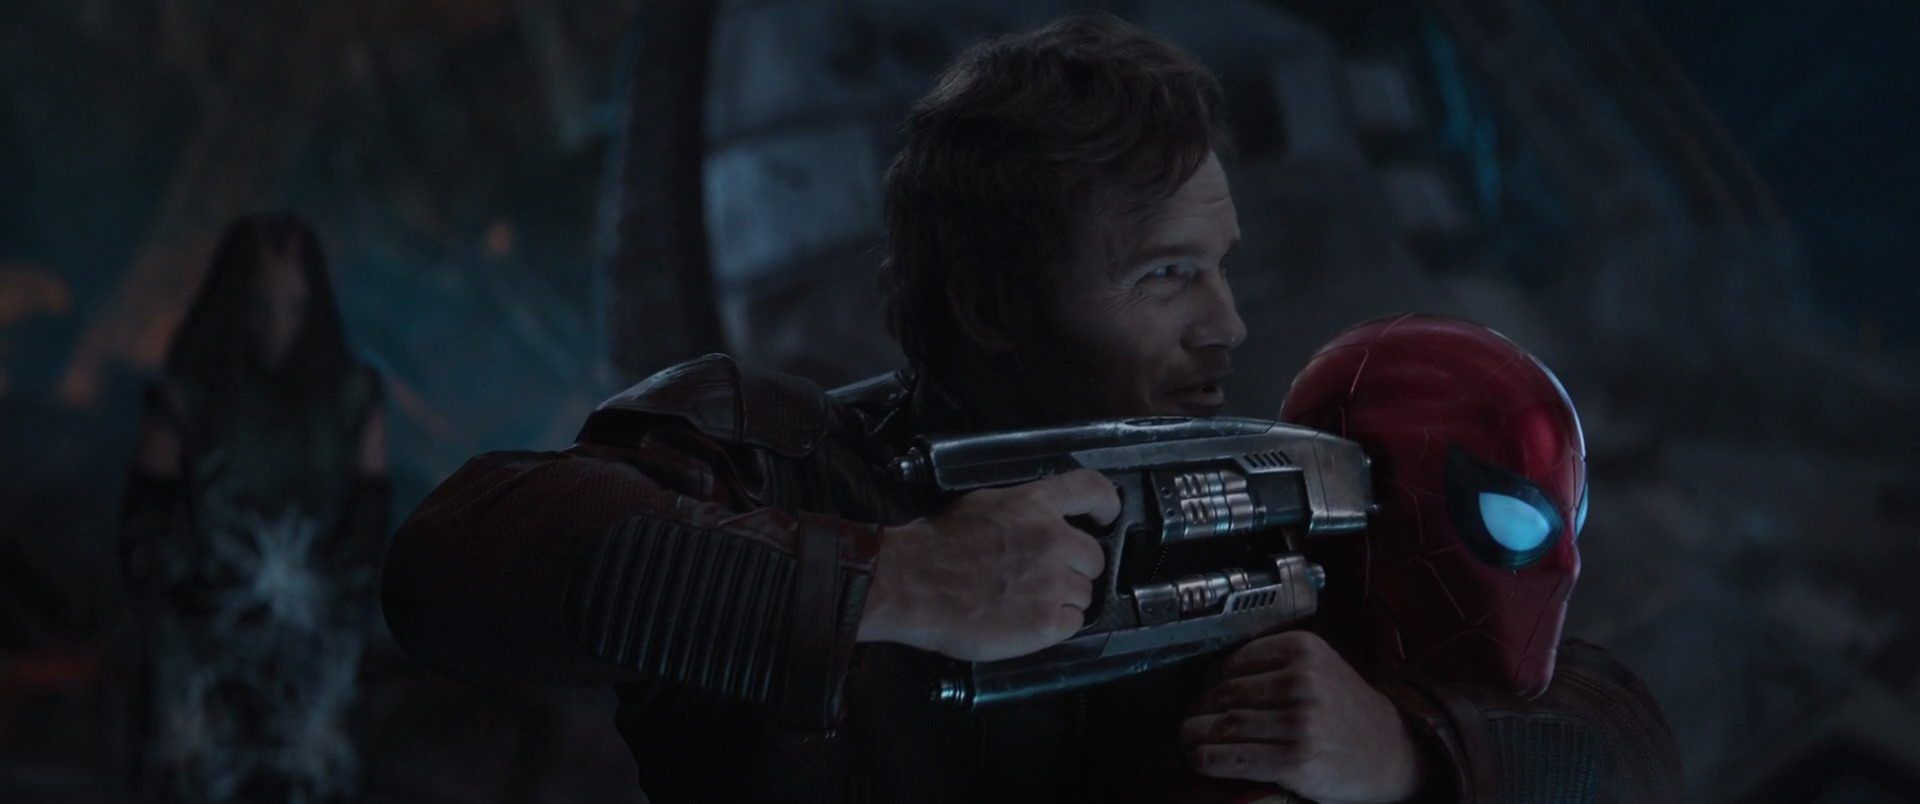 Avengers infinity war avengers movies watch free